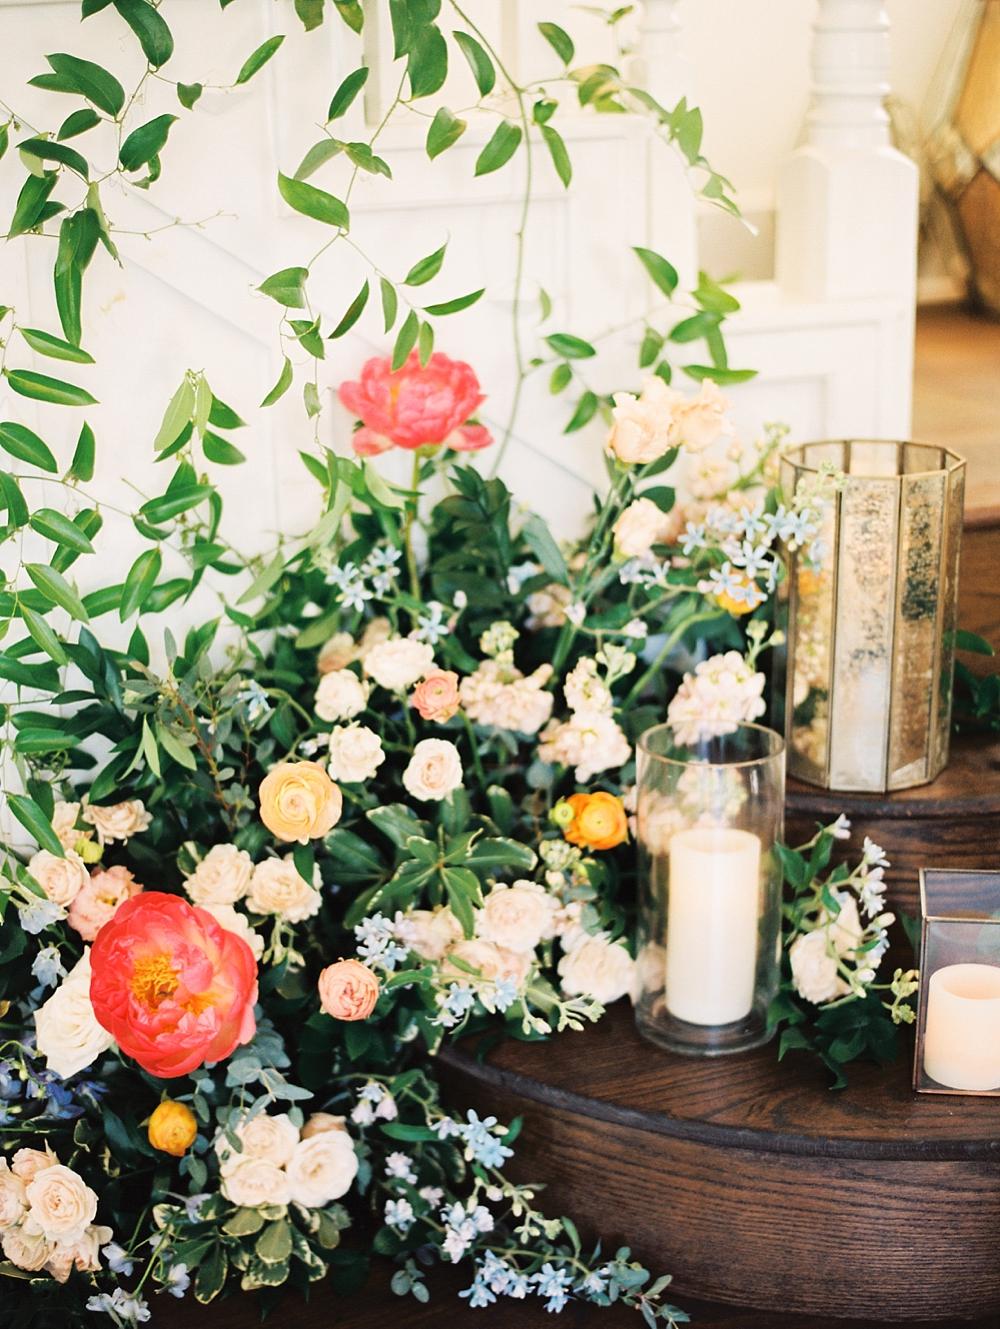 Kristin-La-Voie-Photography-Austin-Wedding-Photographer-the-grand-lady-23